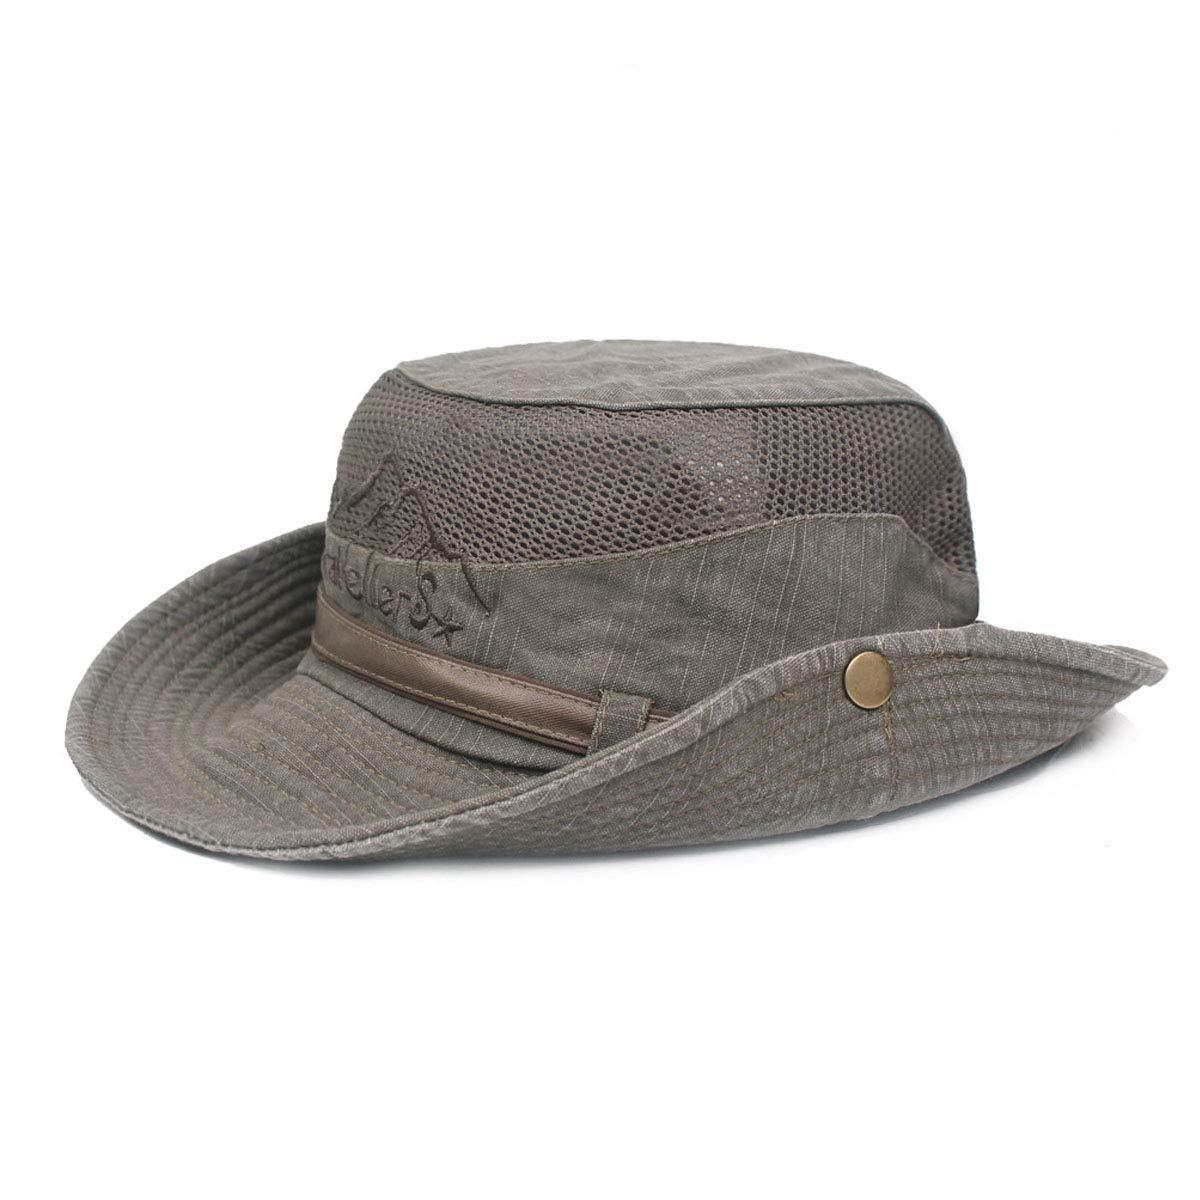 84b99632aa1 King Star Men Summer Cotton Cowboy Sun Hat Wide Brim Bucket Fishing Hats  Army Green at Amazon Men s Clothing store